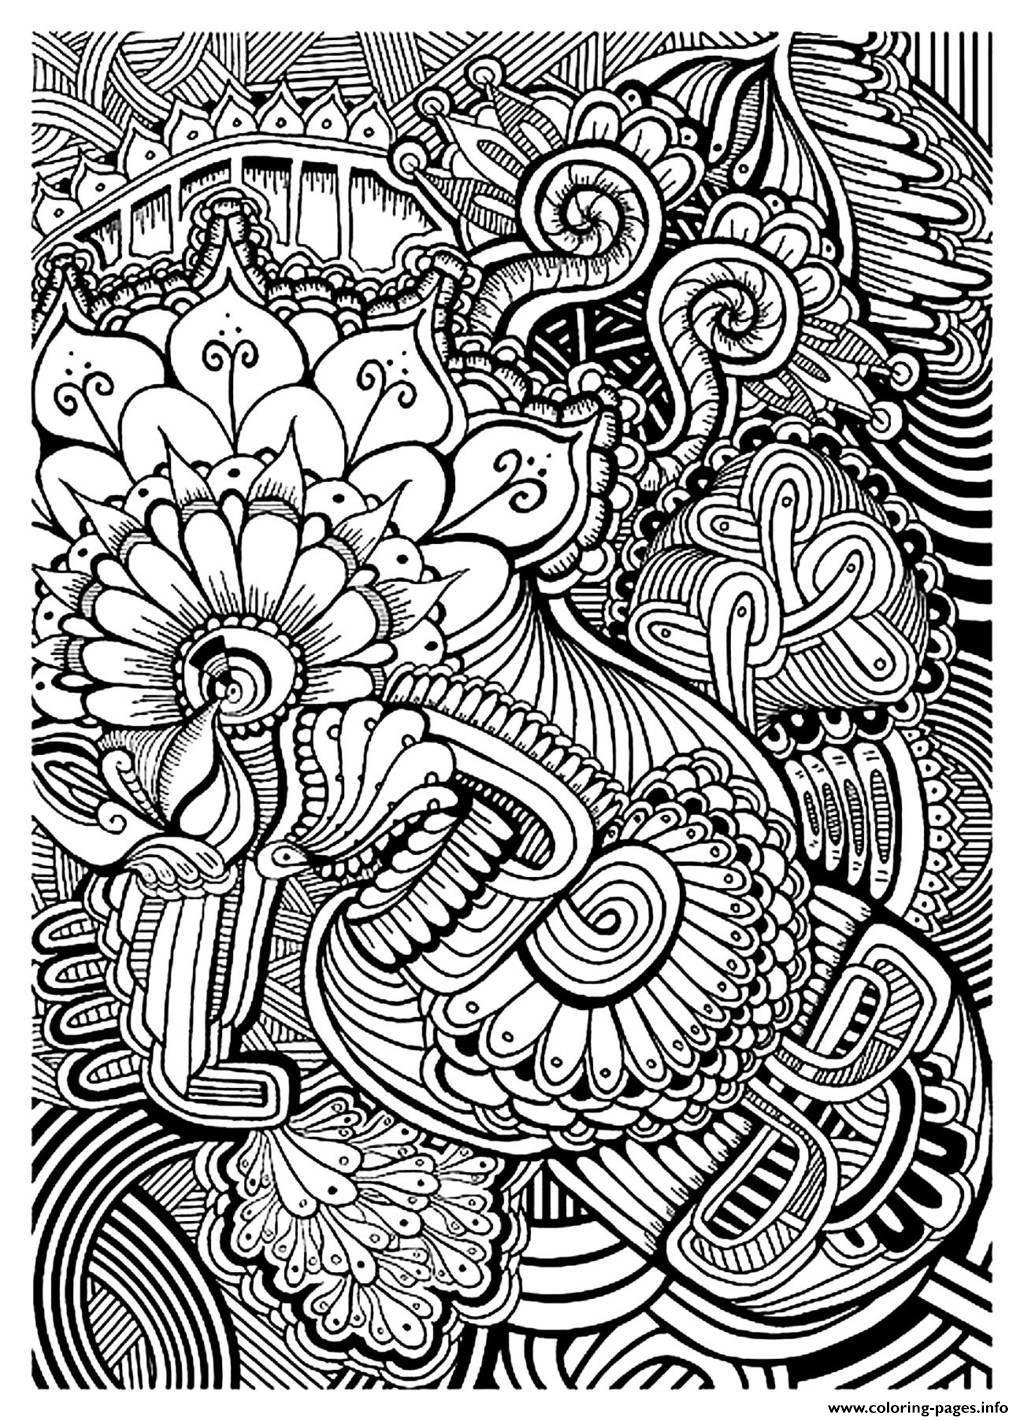 Adult Zen Anti Stress Relax To Print Coloring Pages Printable dedans Coloriages Zen